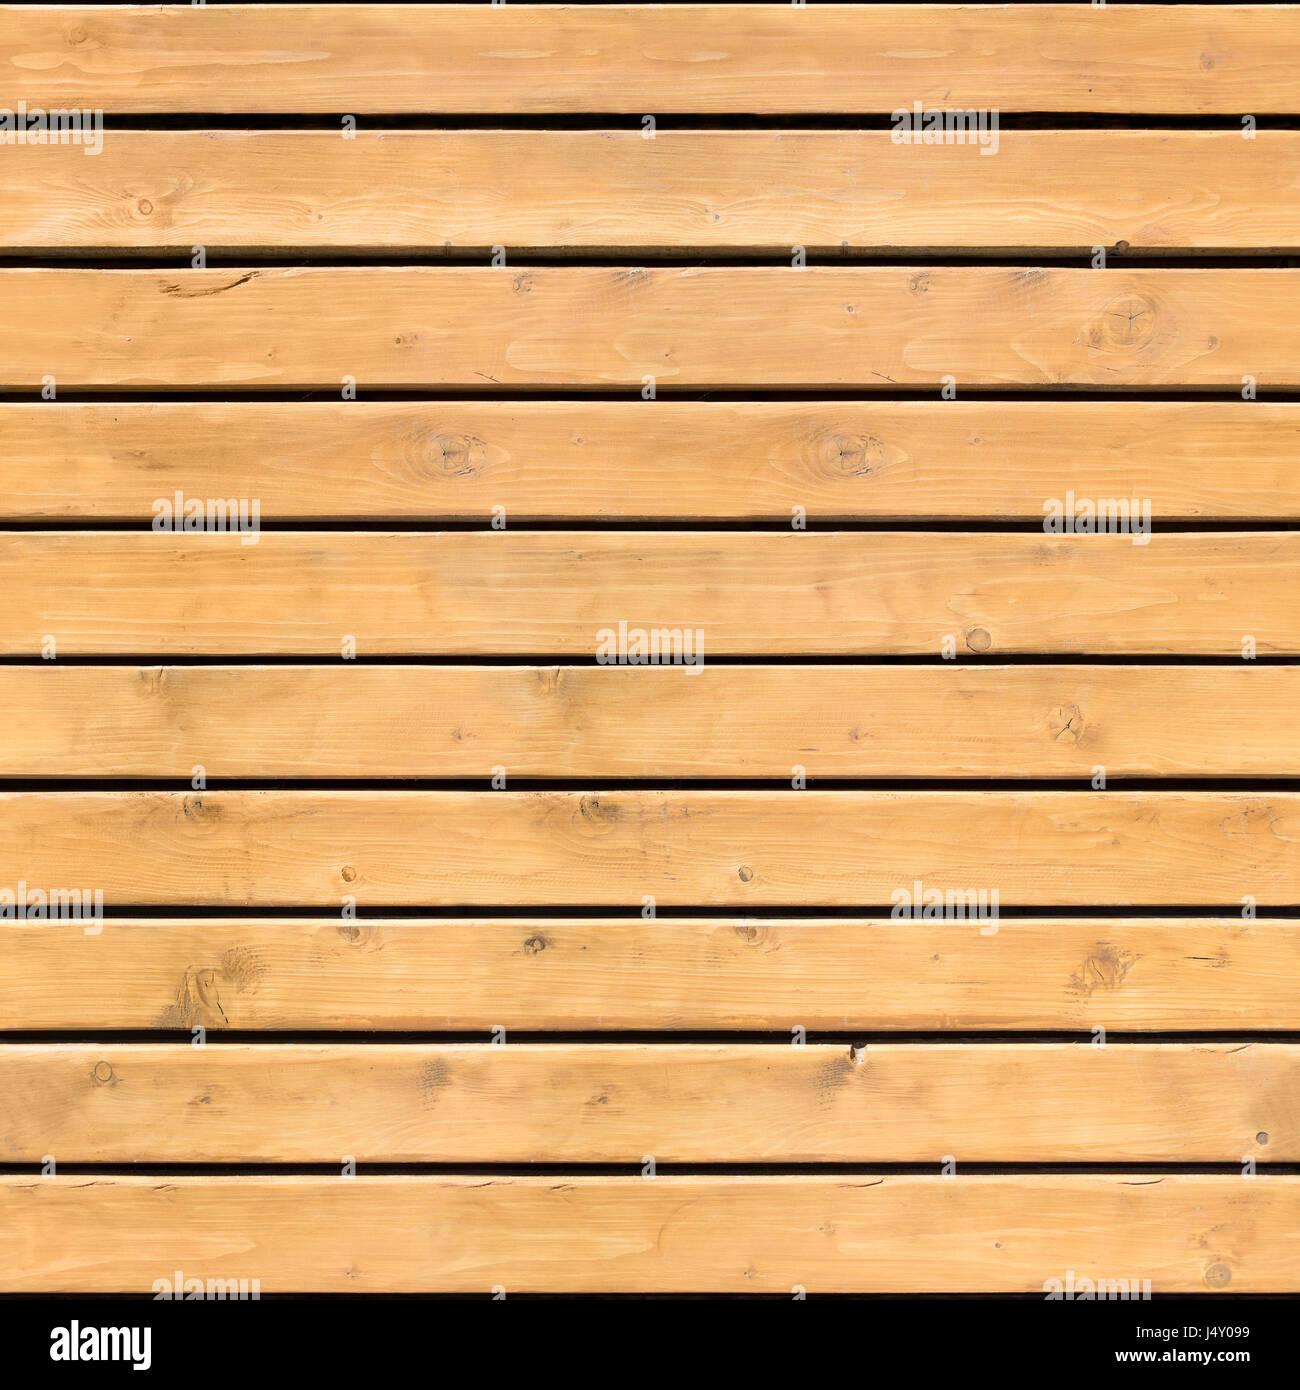 Seamless pattern of brown wooden horizontal planks